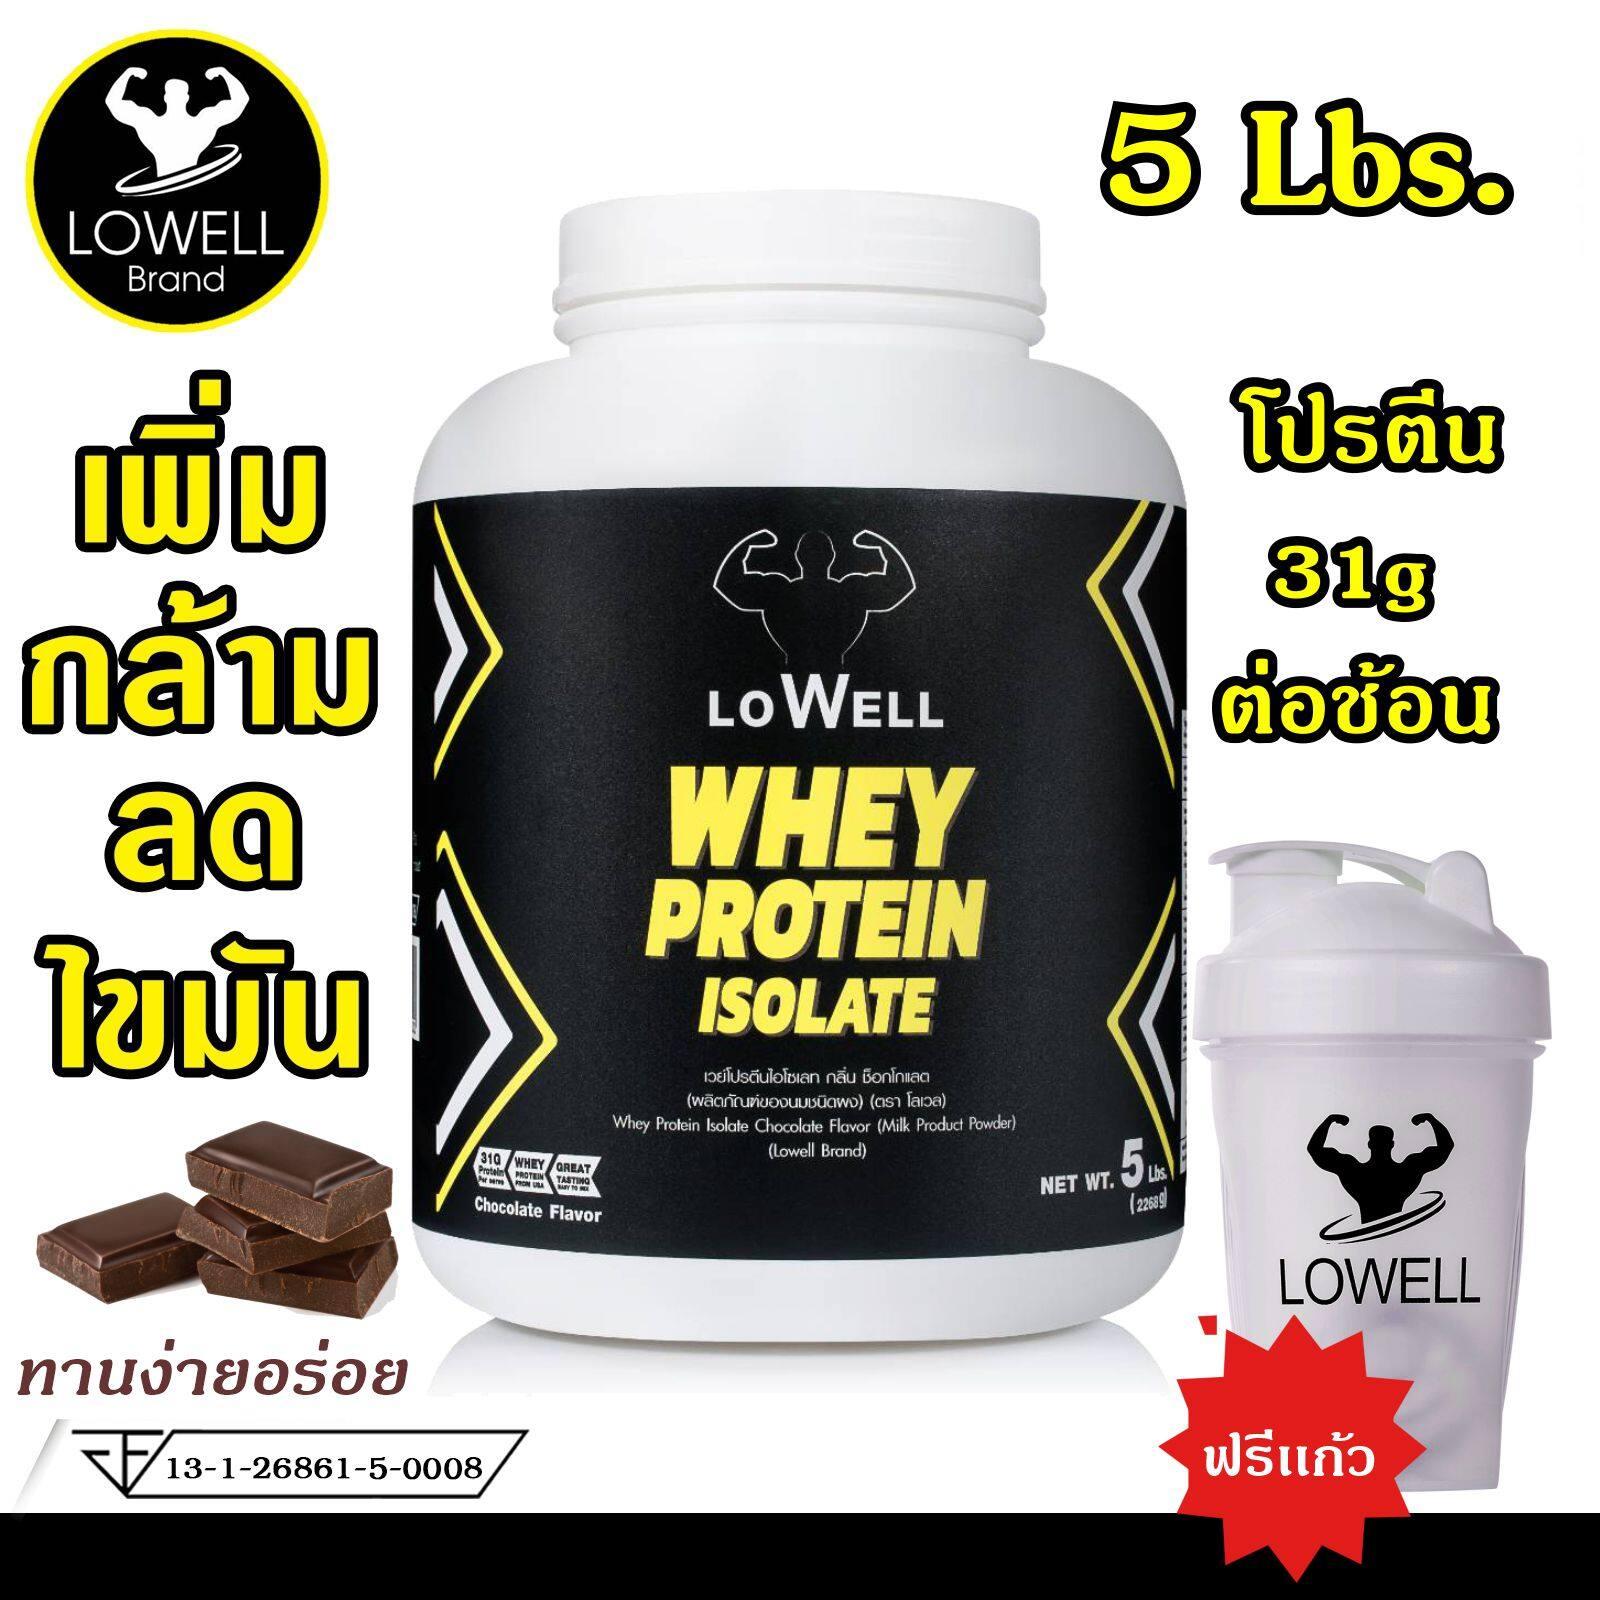 Lowell เวย์โปรตีน ลดไขมัน เพิ่มกล้าม รสช็อกโกเเลต Whey Protein Isolate โปรตีน โปรตีนเวย์ ขนาด 5ปอนด์ เเบบกระปุก.